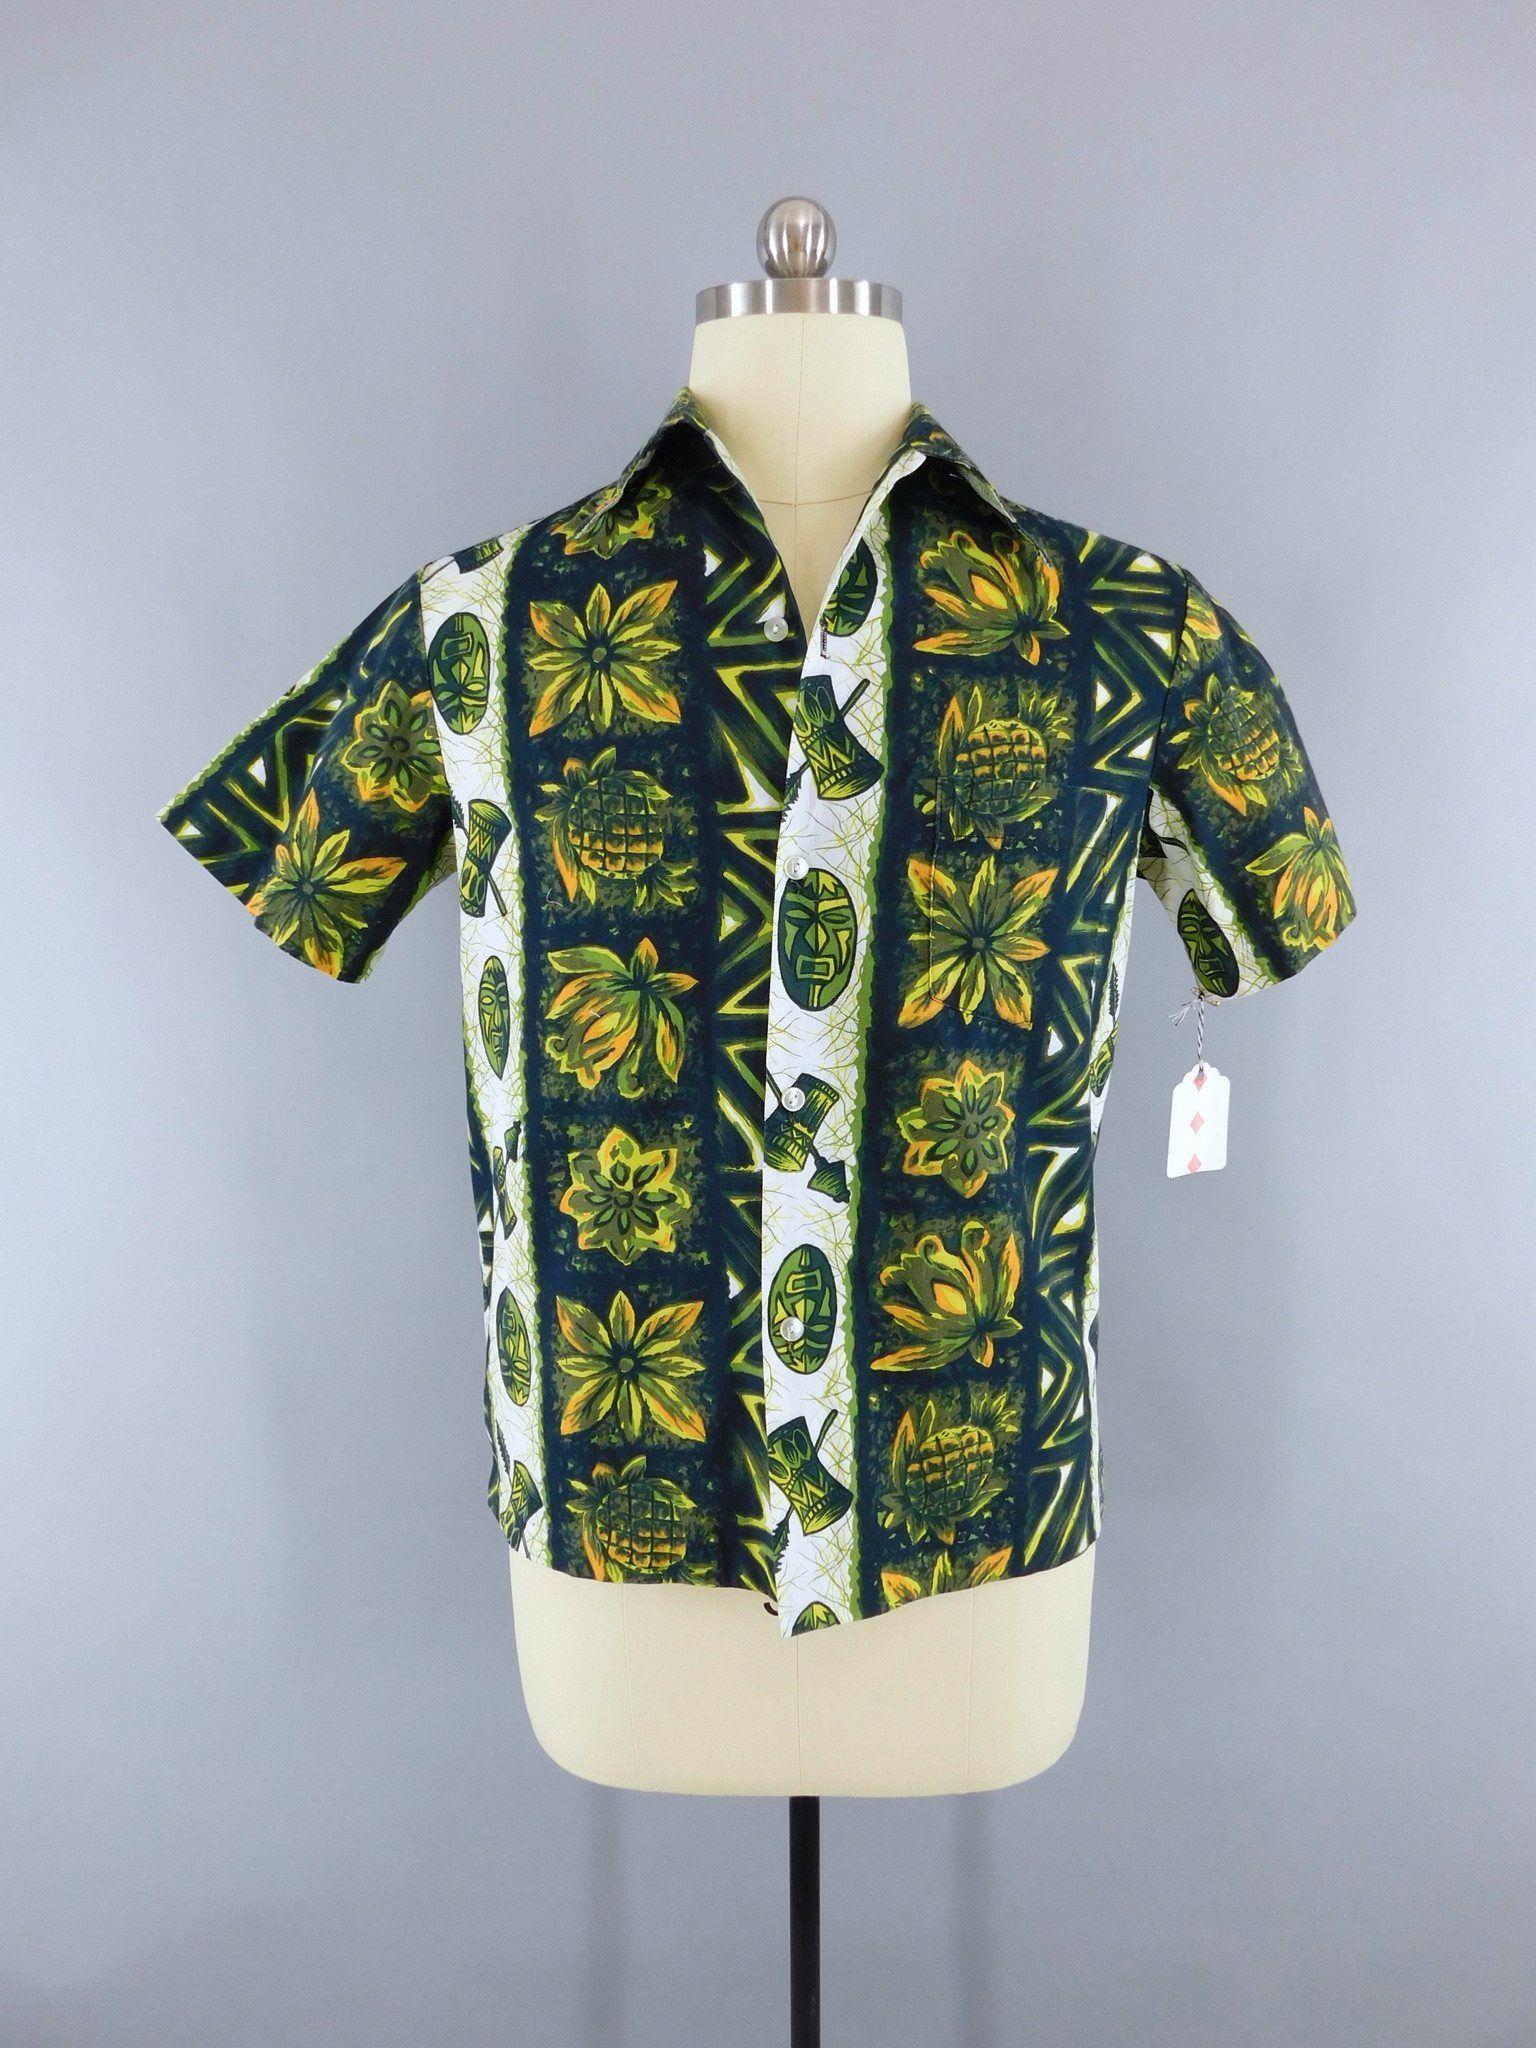 fd13ff98 Vintage 1960s Hawaiian Shirt / Green Pineapple Polynesian / Ui-Maikai  #AlohaShirt #60s #aloha #1960s